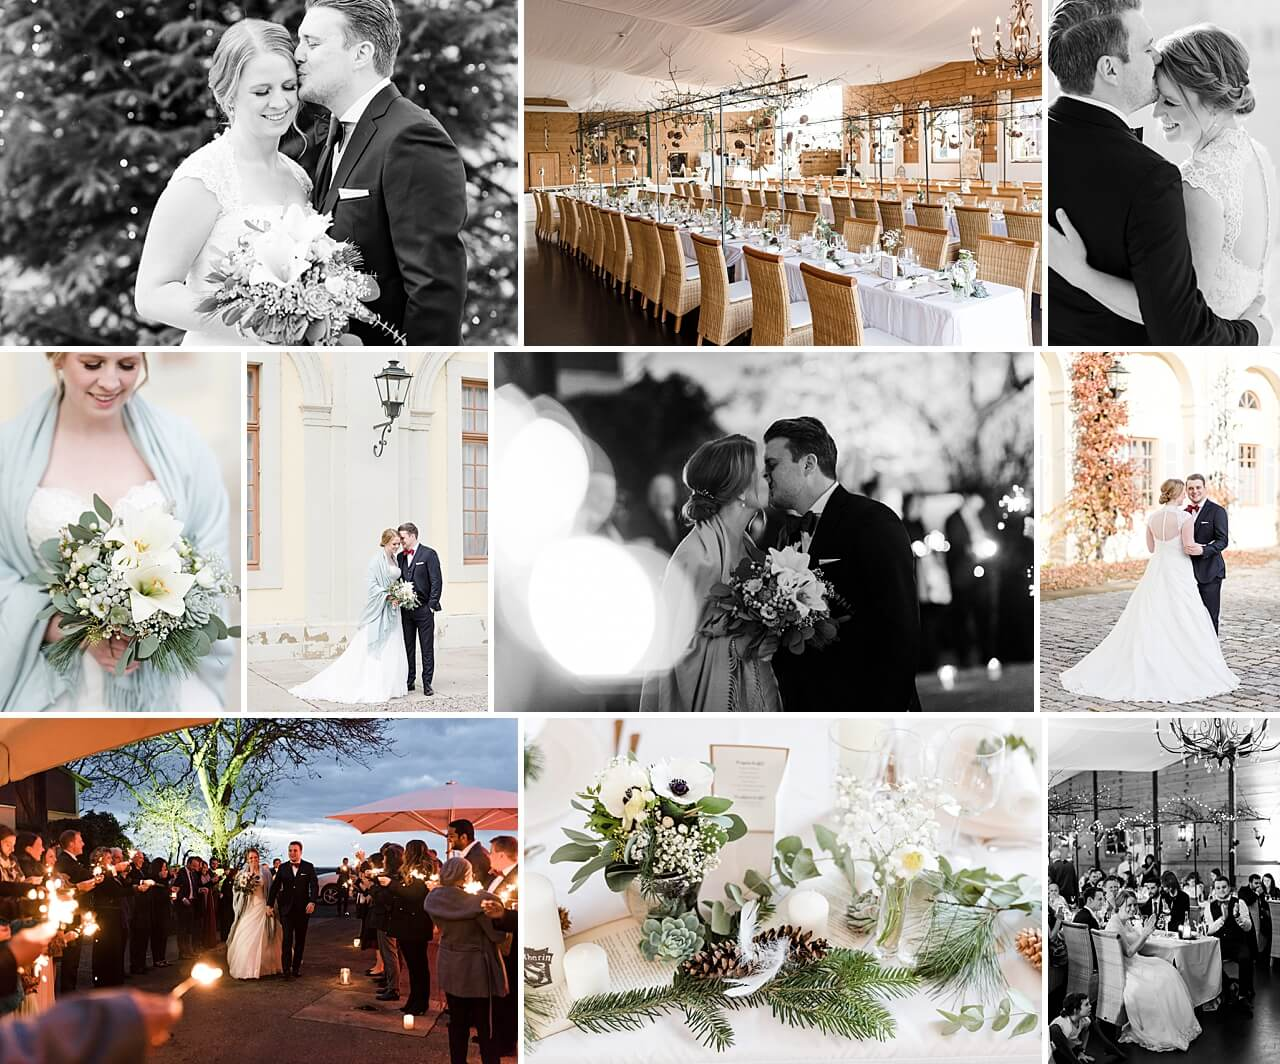 Rebecca Conte Fotografie: Verschiebung Hochzeit wegen Corona 03